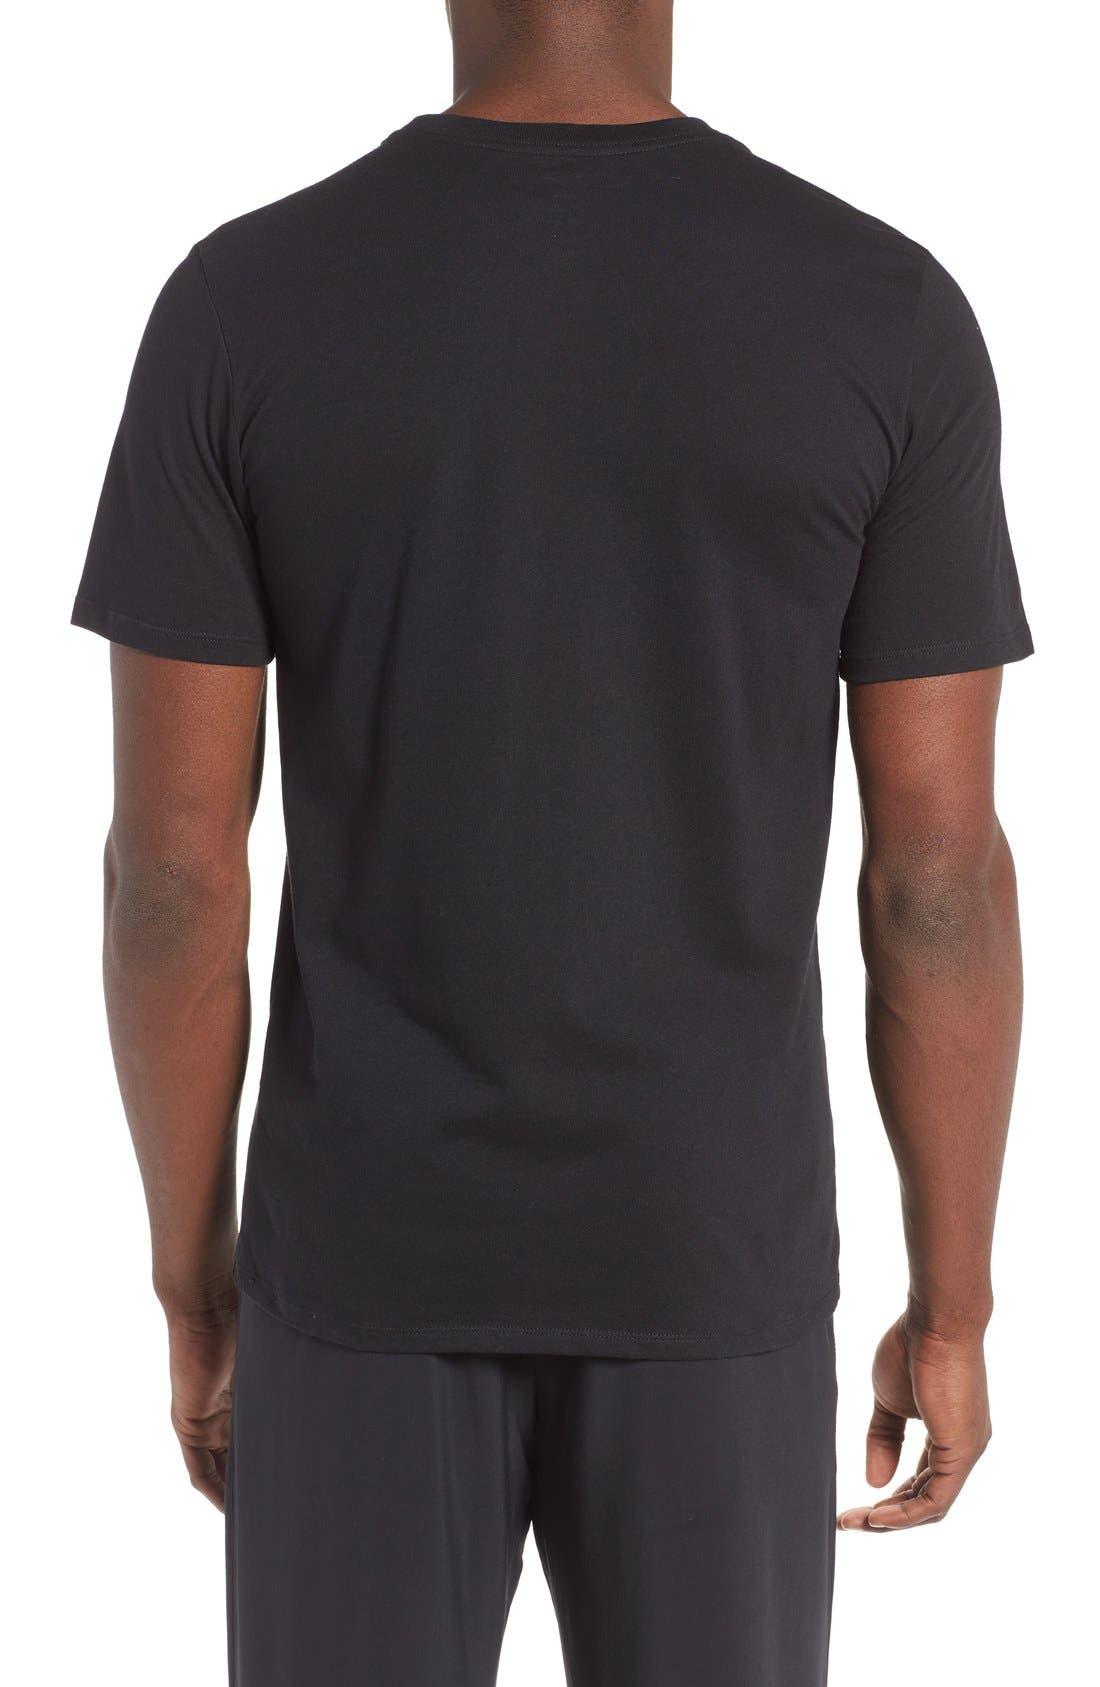 Just Buckets T-Shirt,                             Alternate thumbnail 6, color,                             010